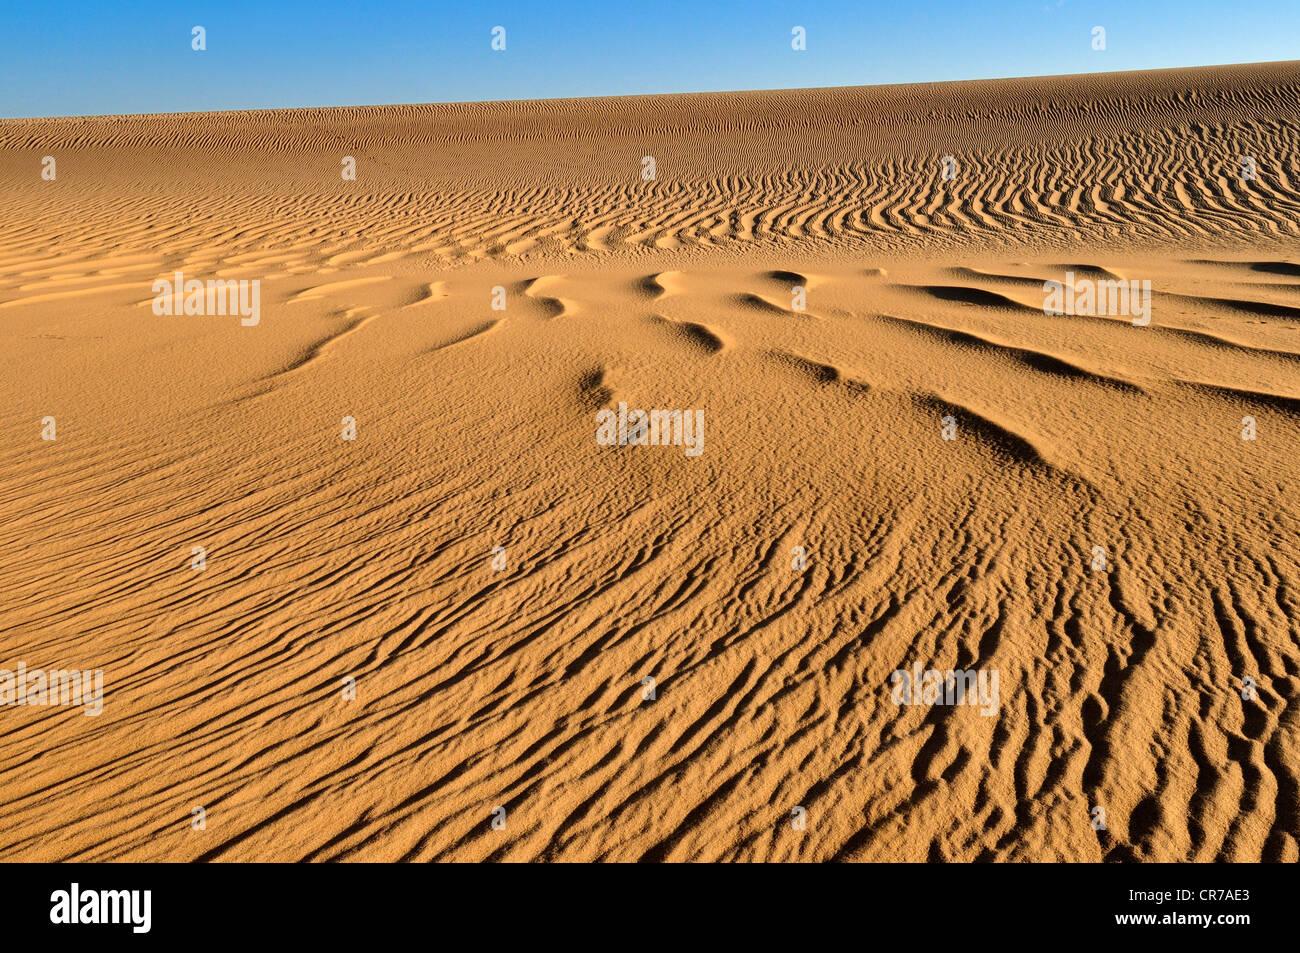 Argelia, el Sahara, Vista de dunas de arena Imagen De Stock